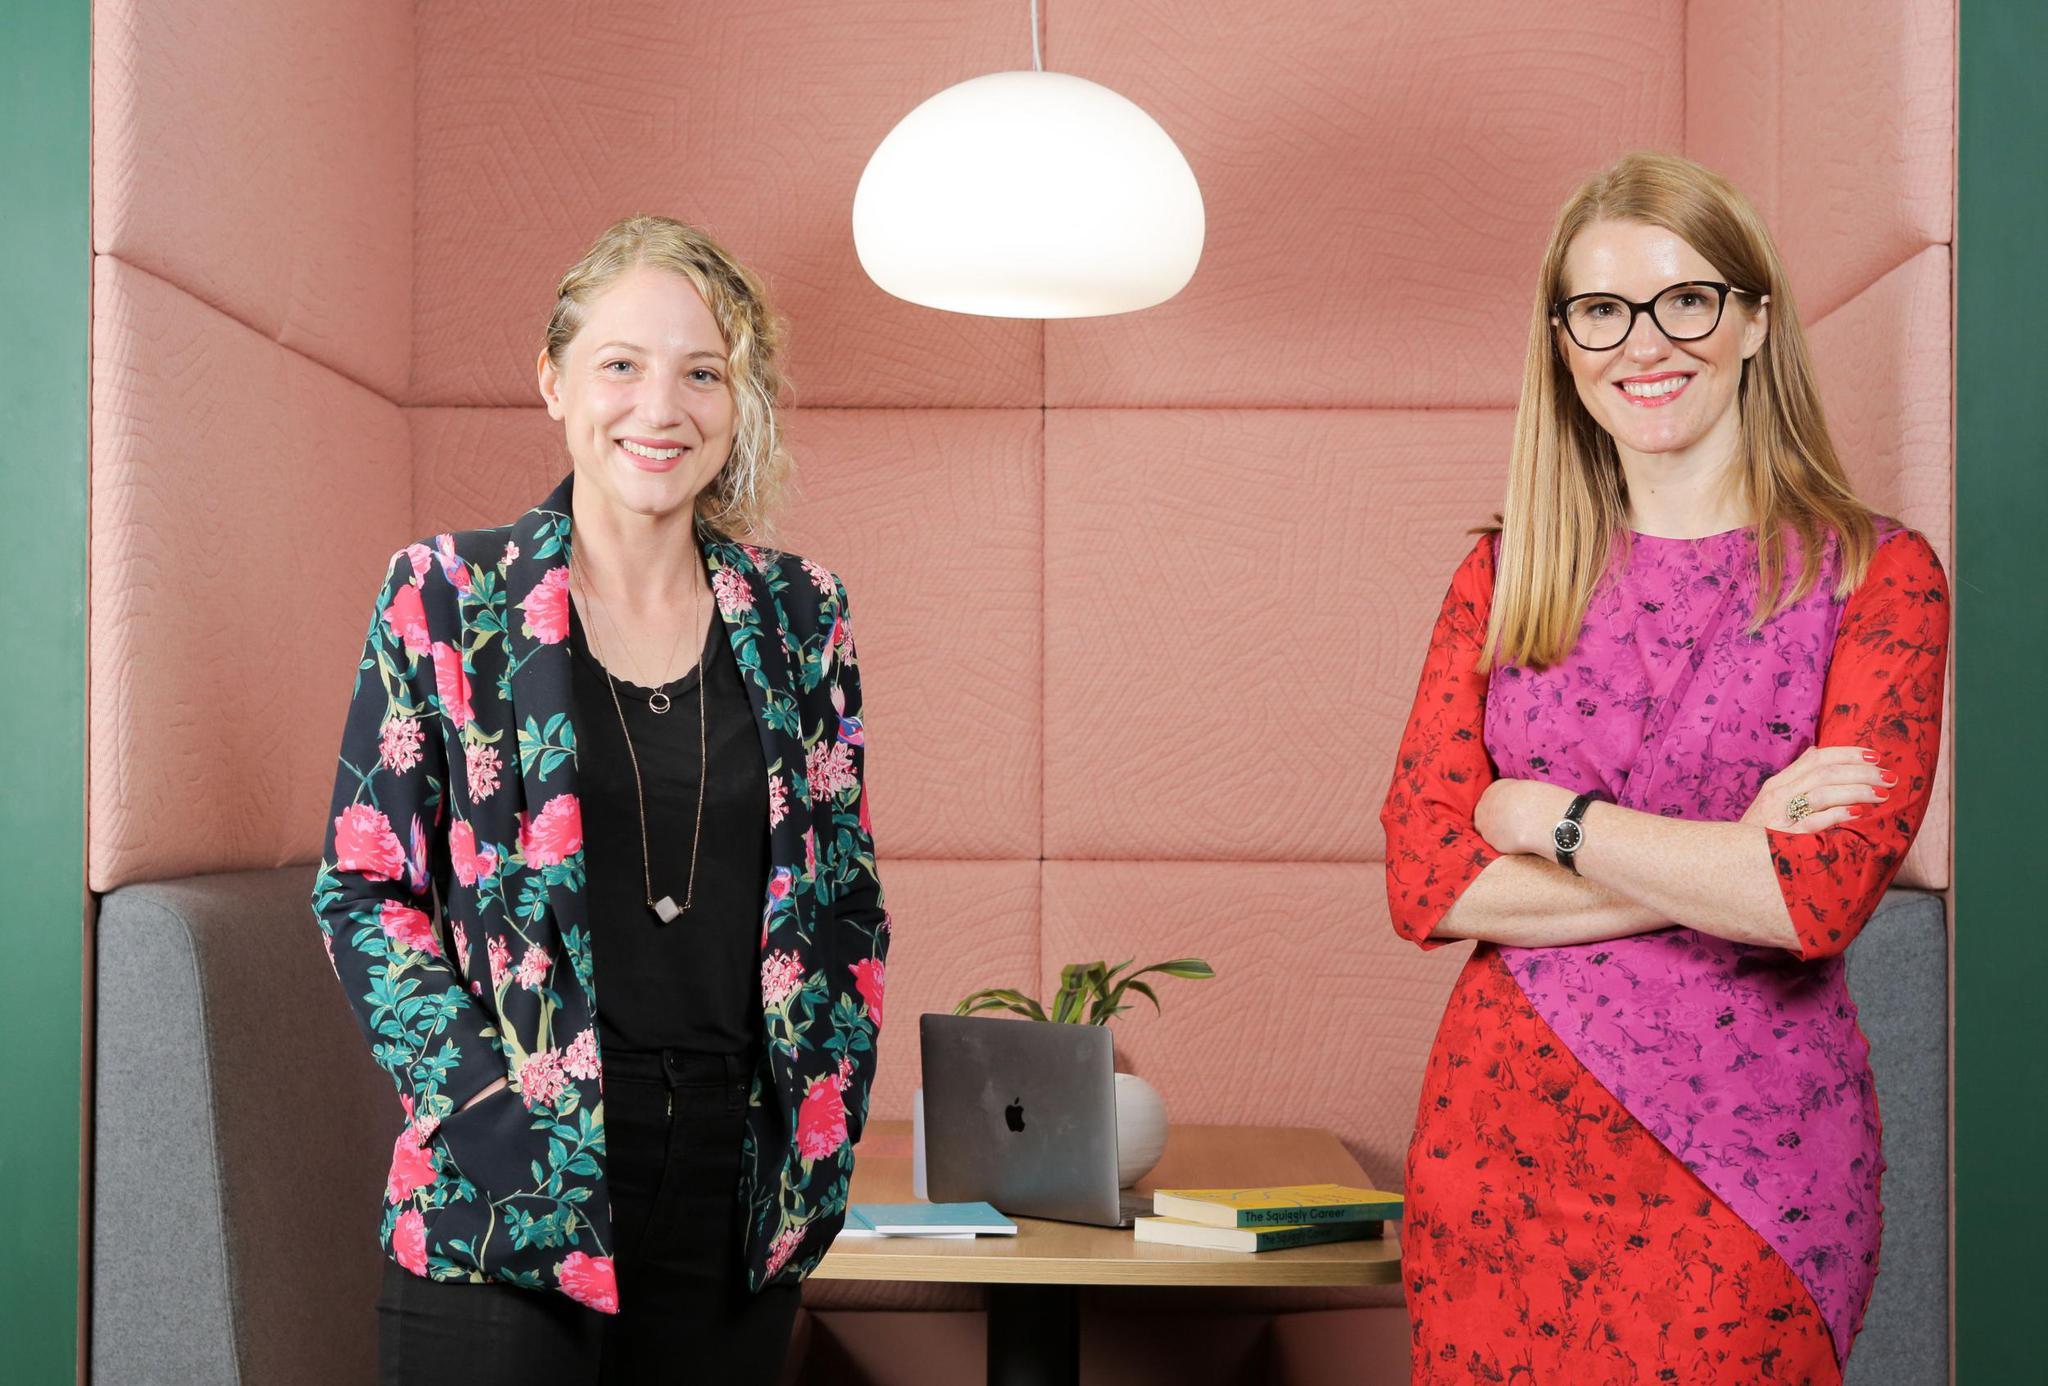 HelenTupperandher Squiggly Career co-author and co-host Sarah Ellis (MattWrittle)Matt Writtle